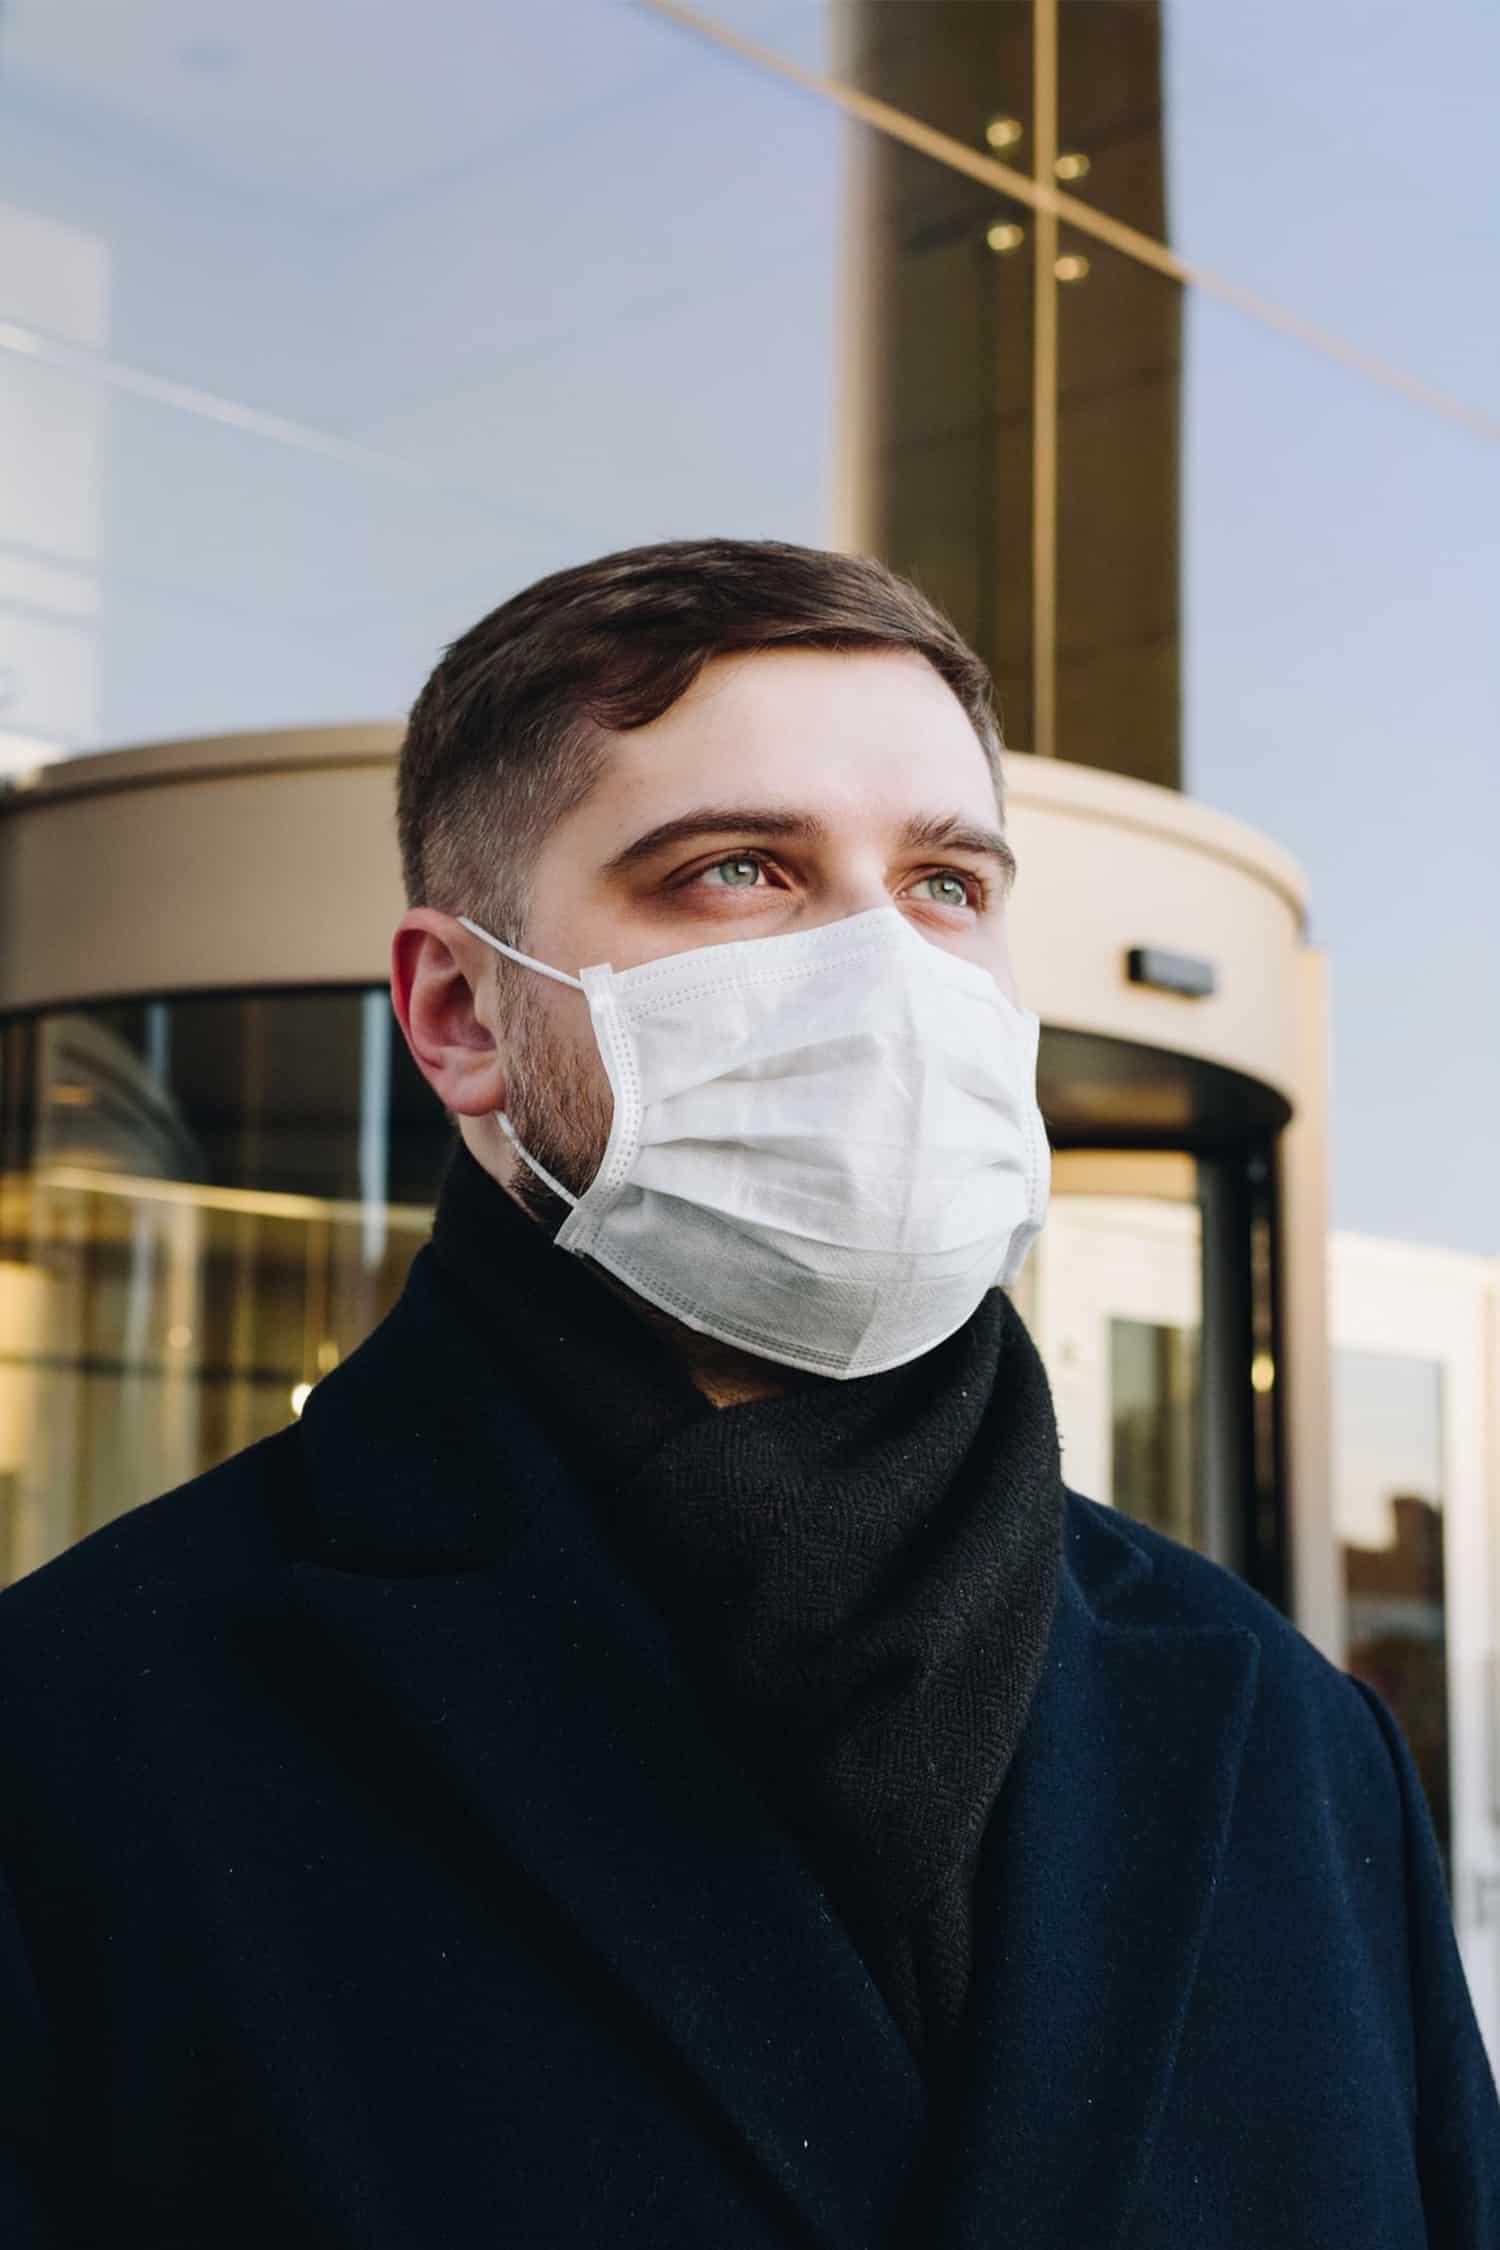 man_mask